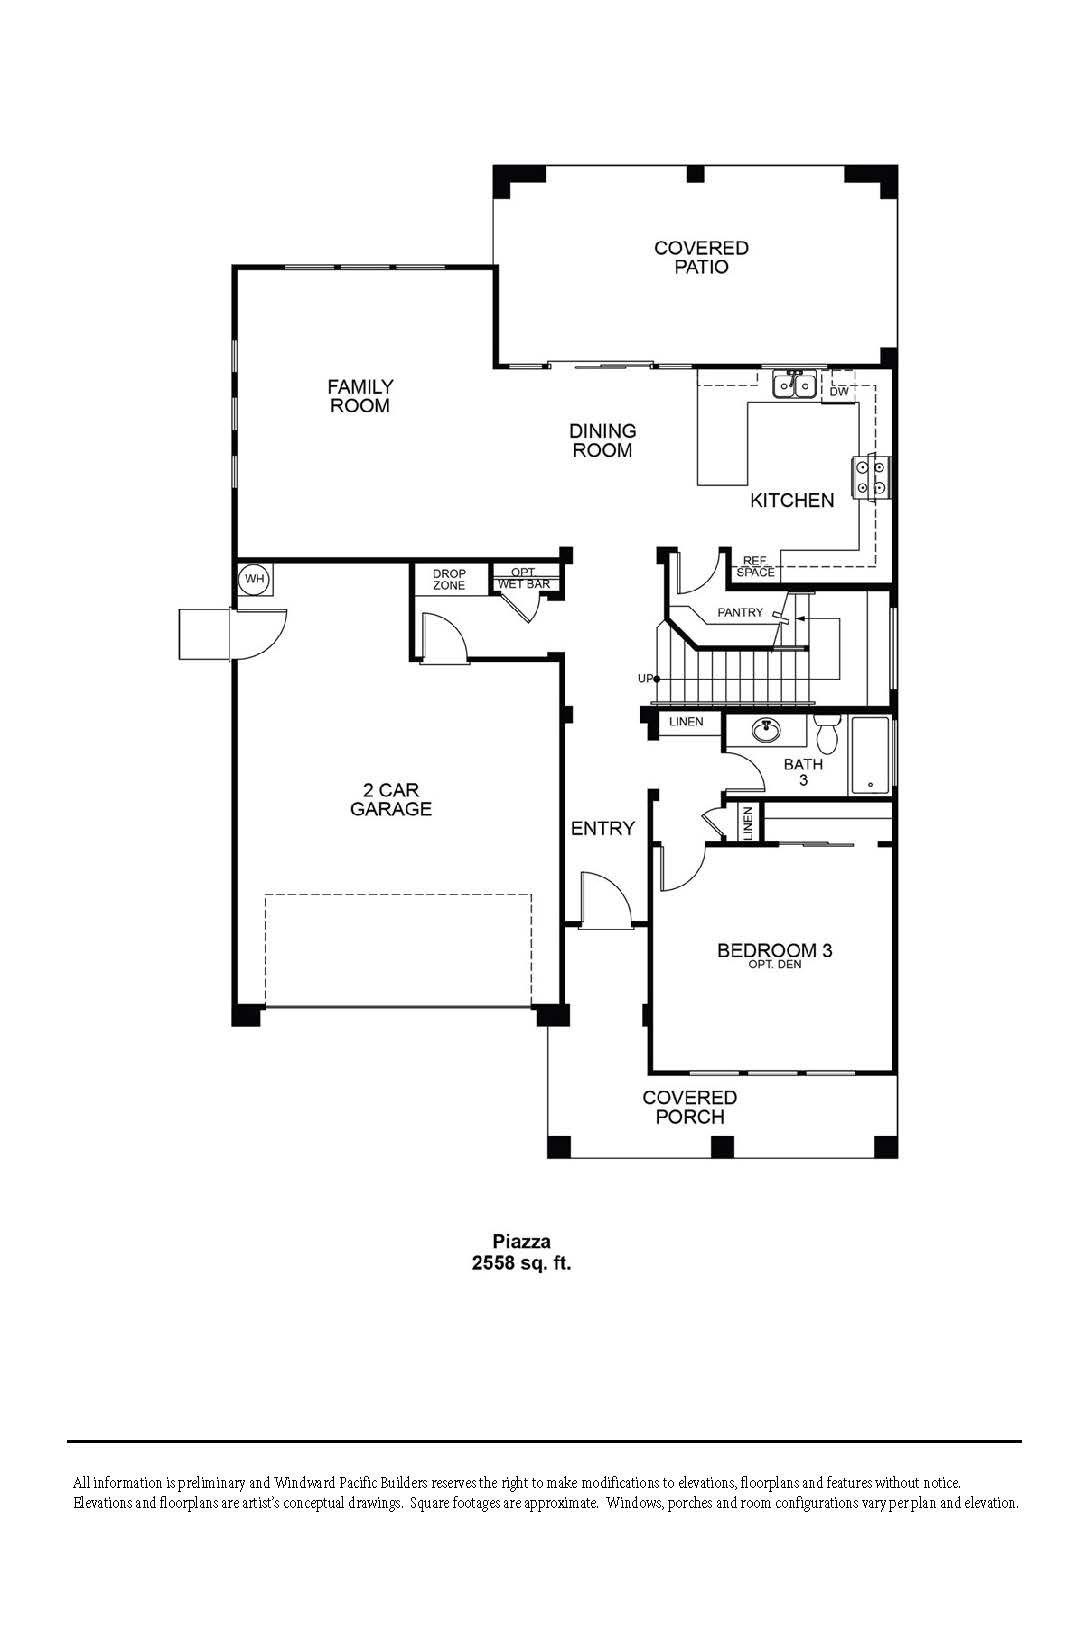 century home builders floor plans home free download home mid century modern floor plans mid century modern house